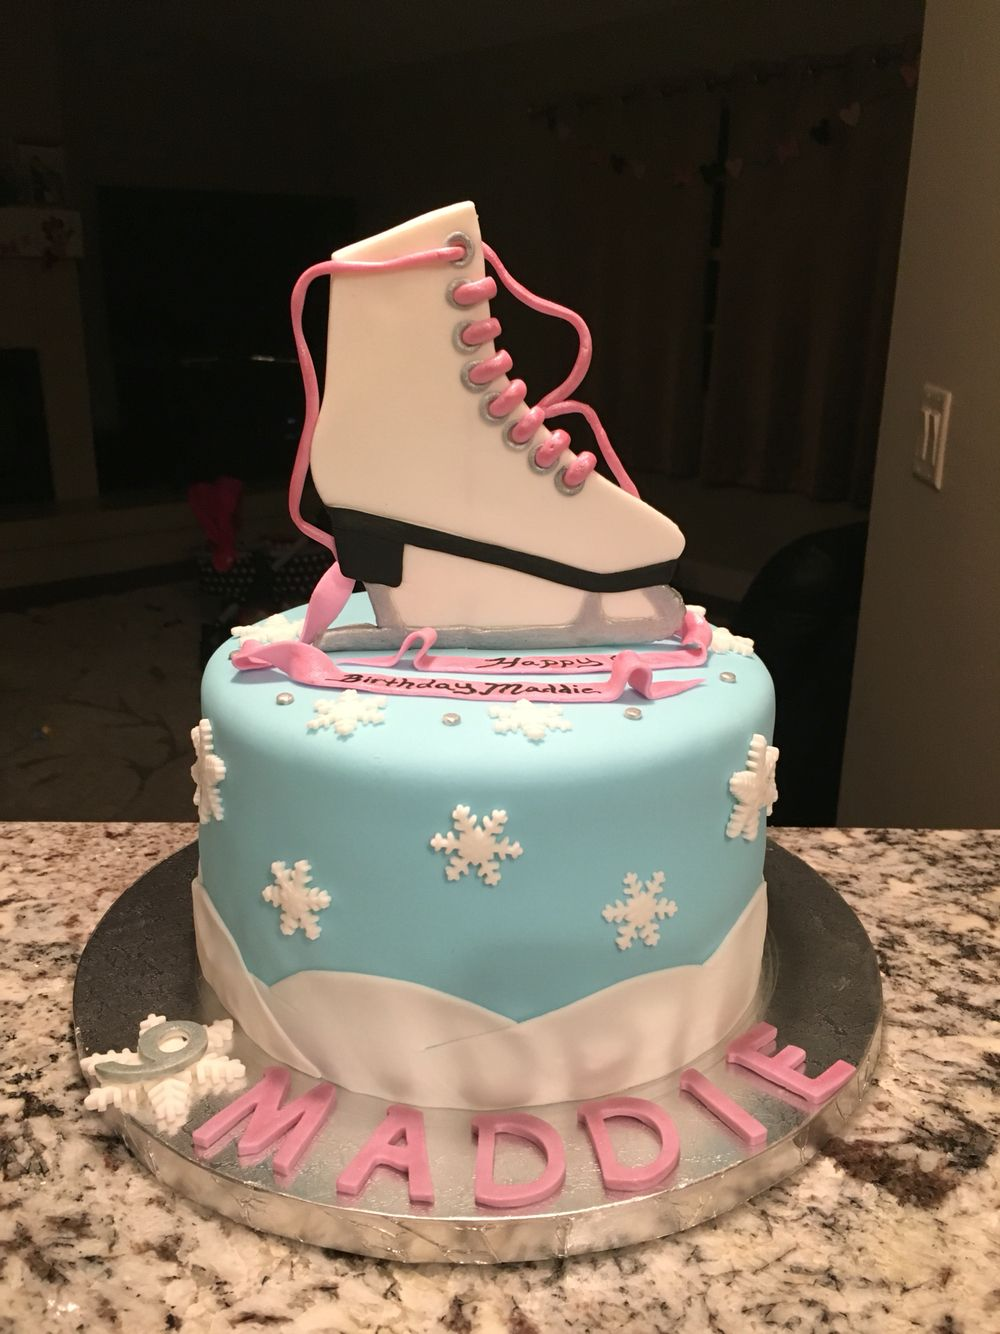 Custom ice skate cake